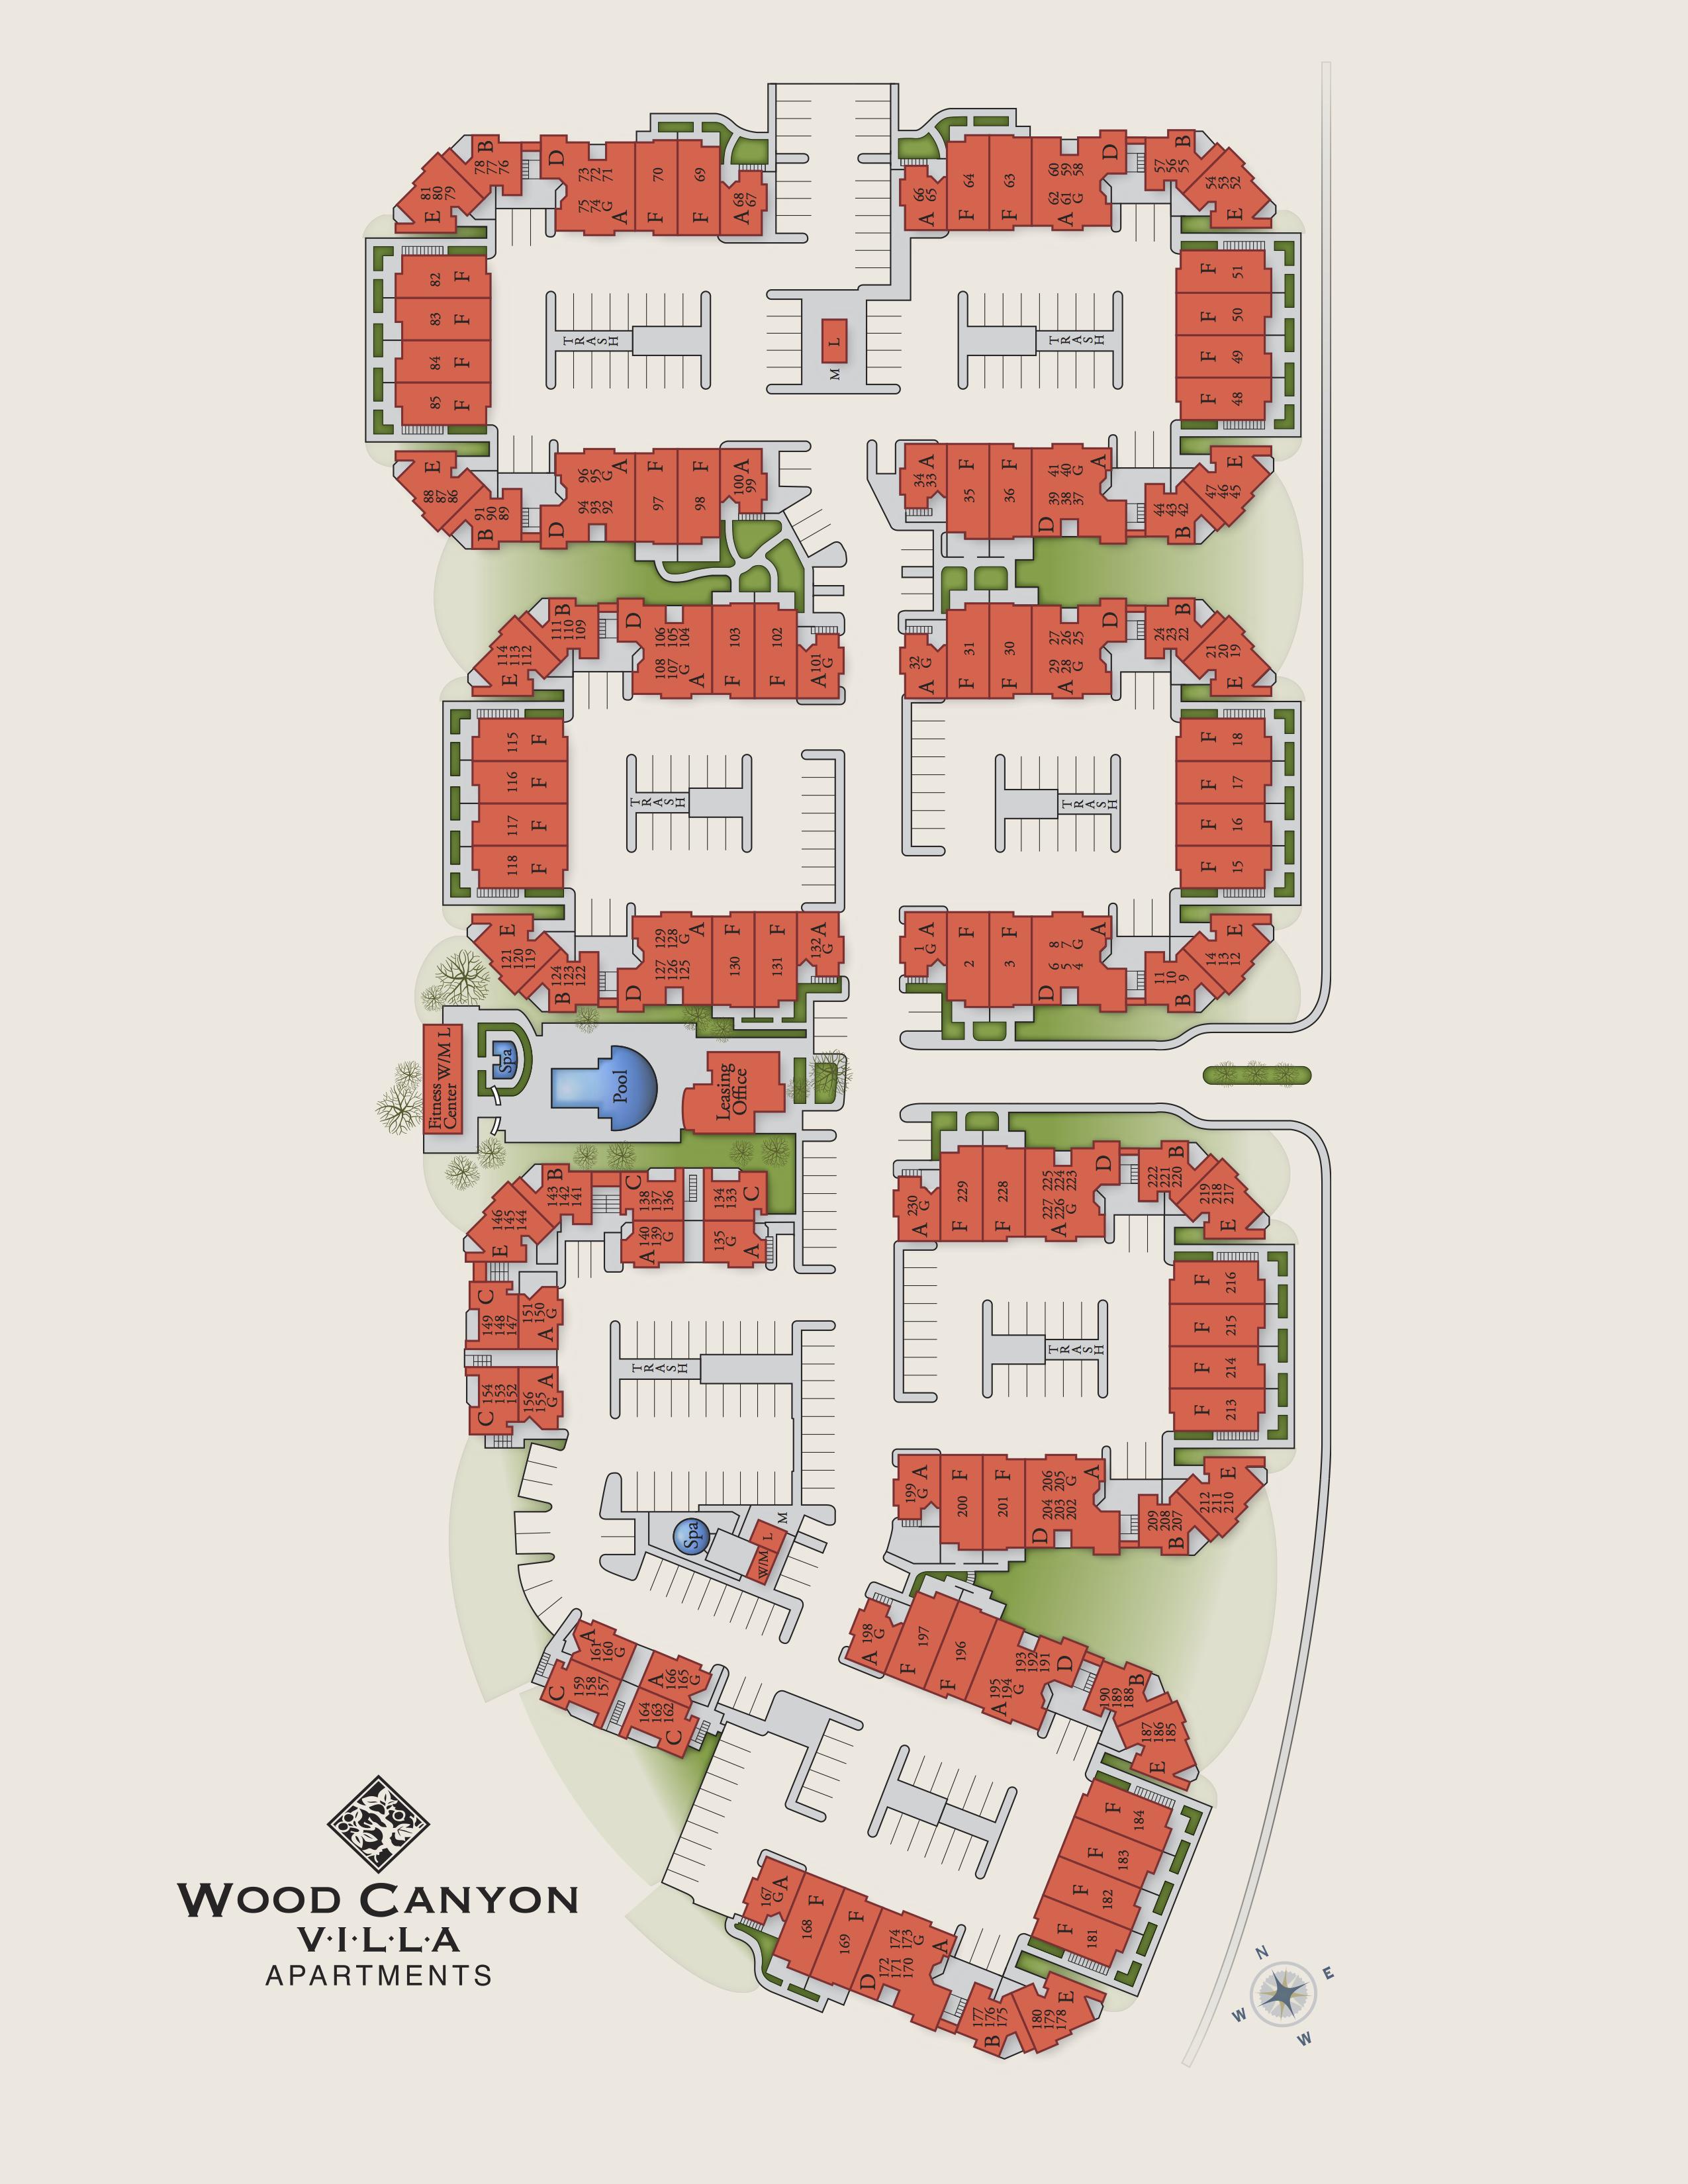 Wood Canyon Villa Apartment Homes - Site Map